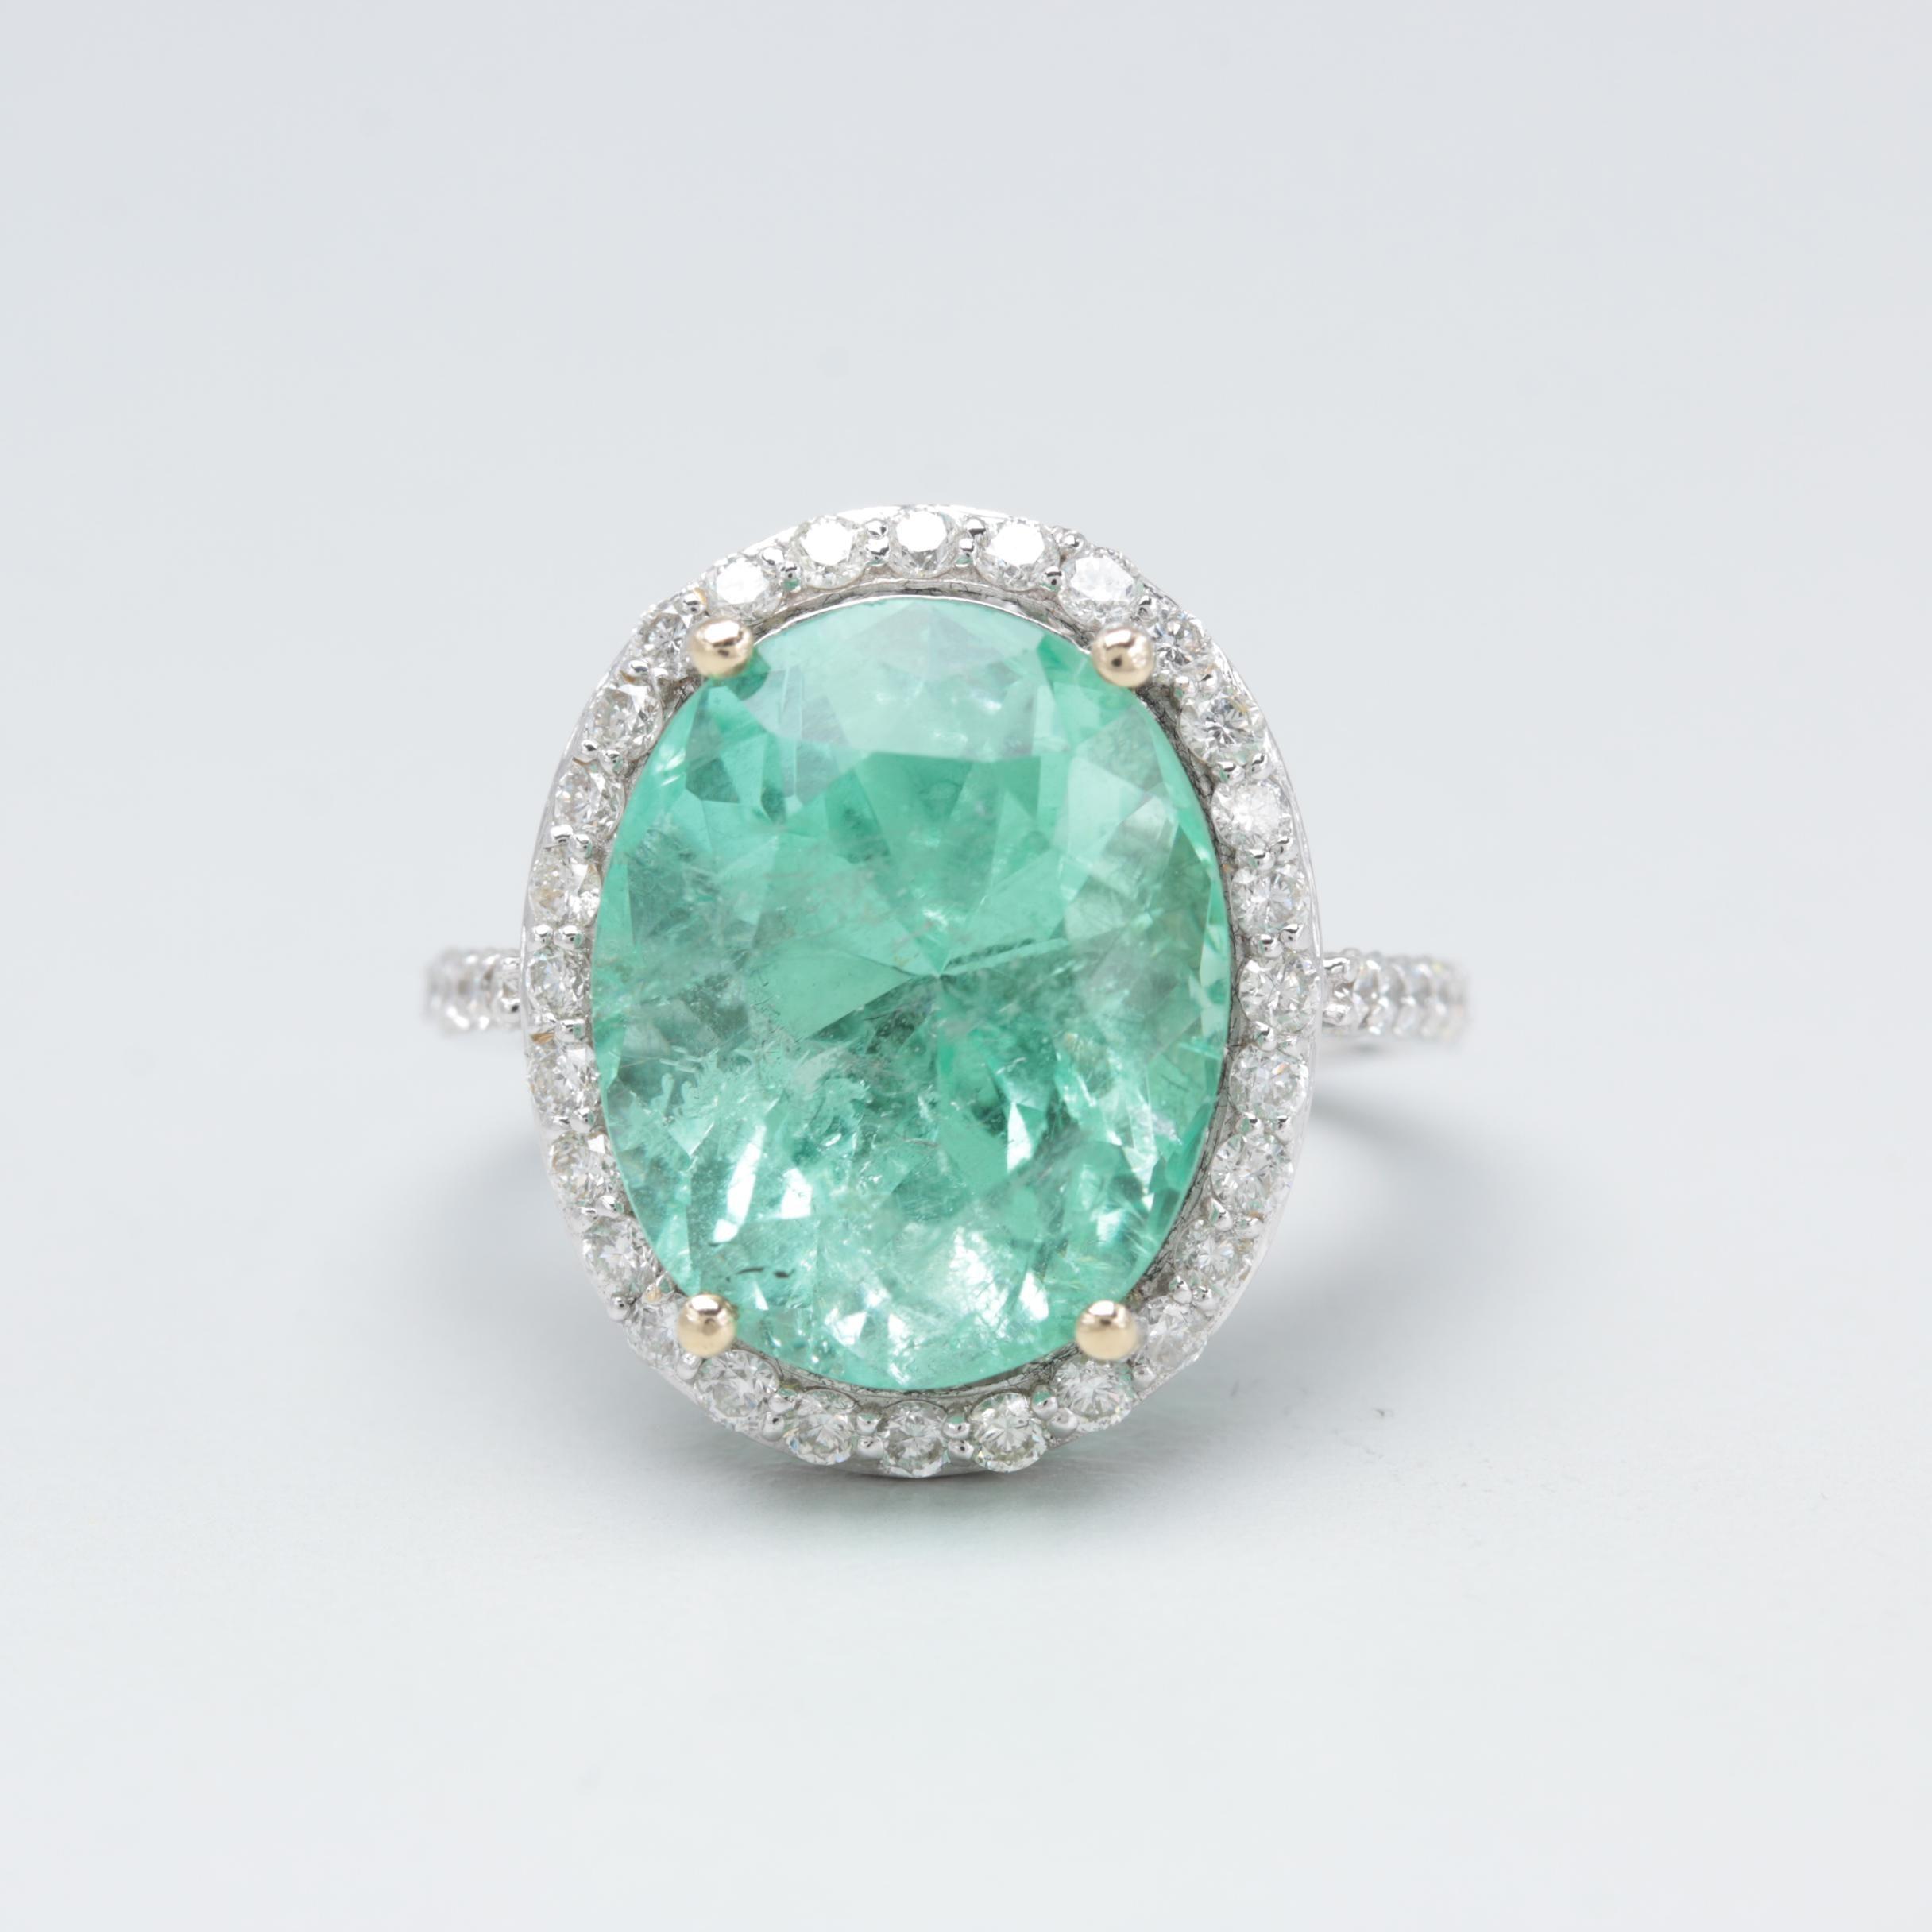 18K White Gold 10.10 CT Green Beryl and Diamond Ring